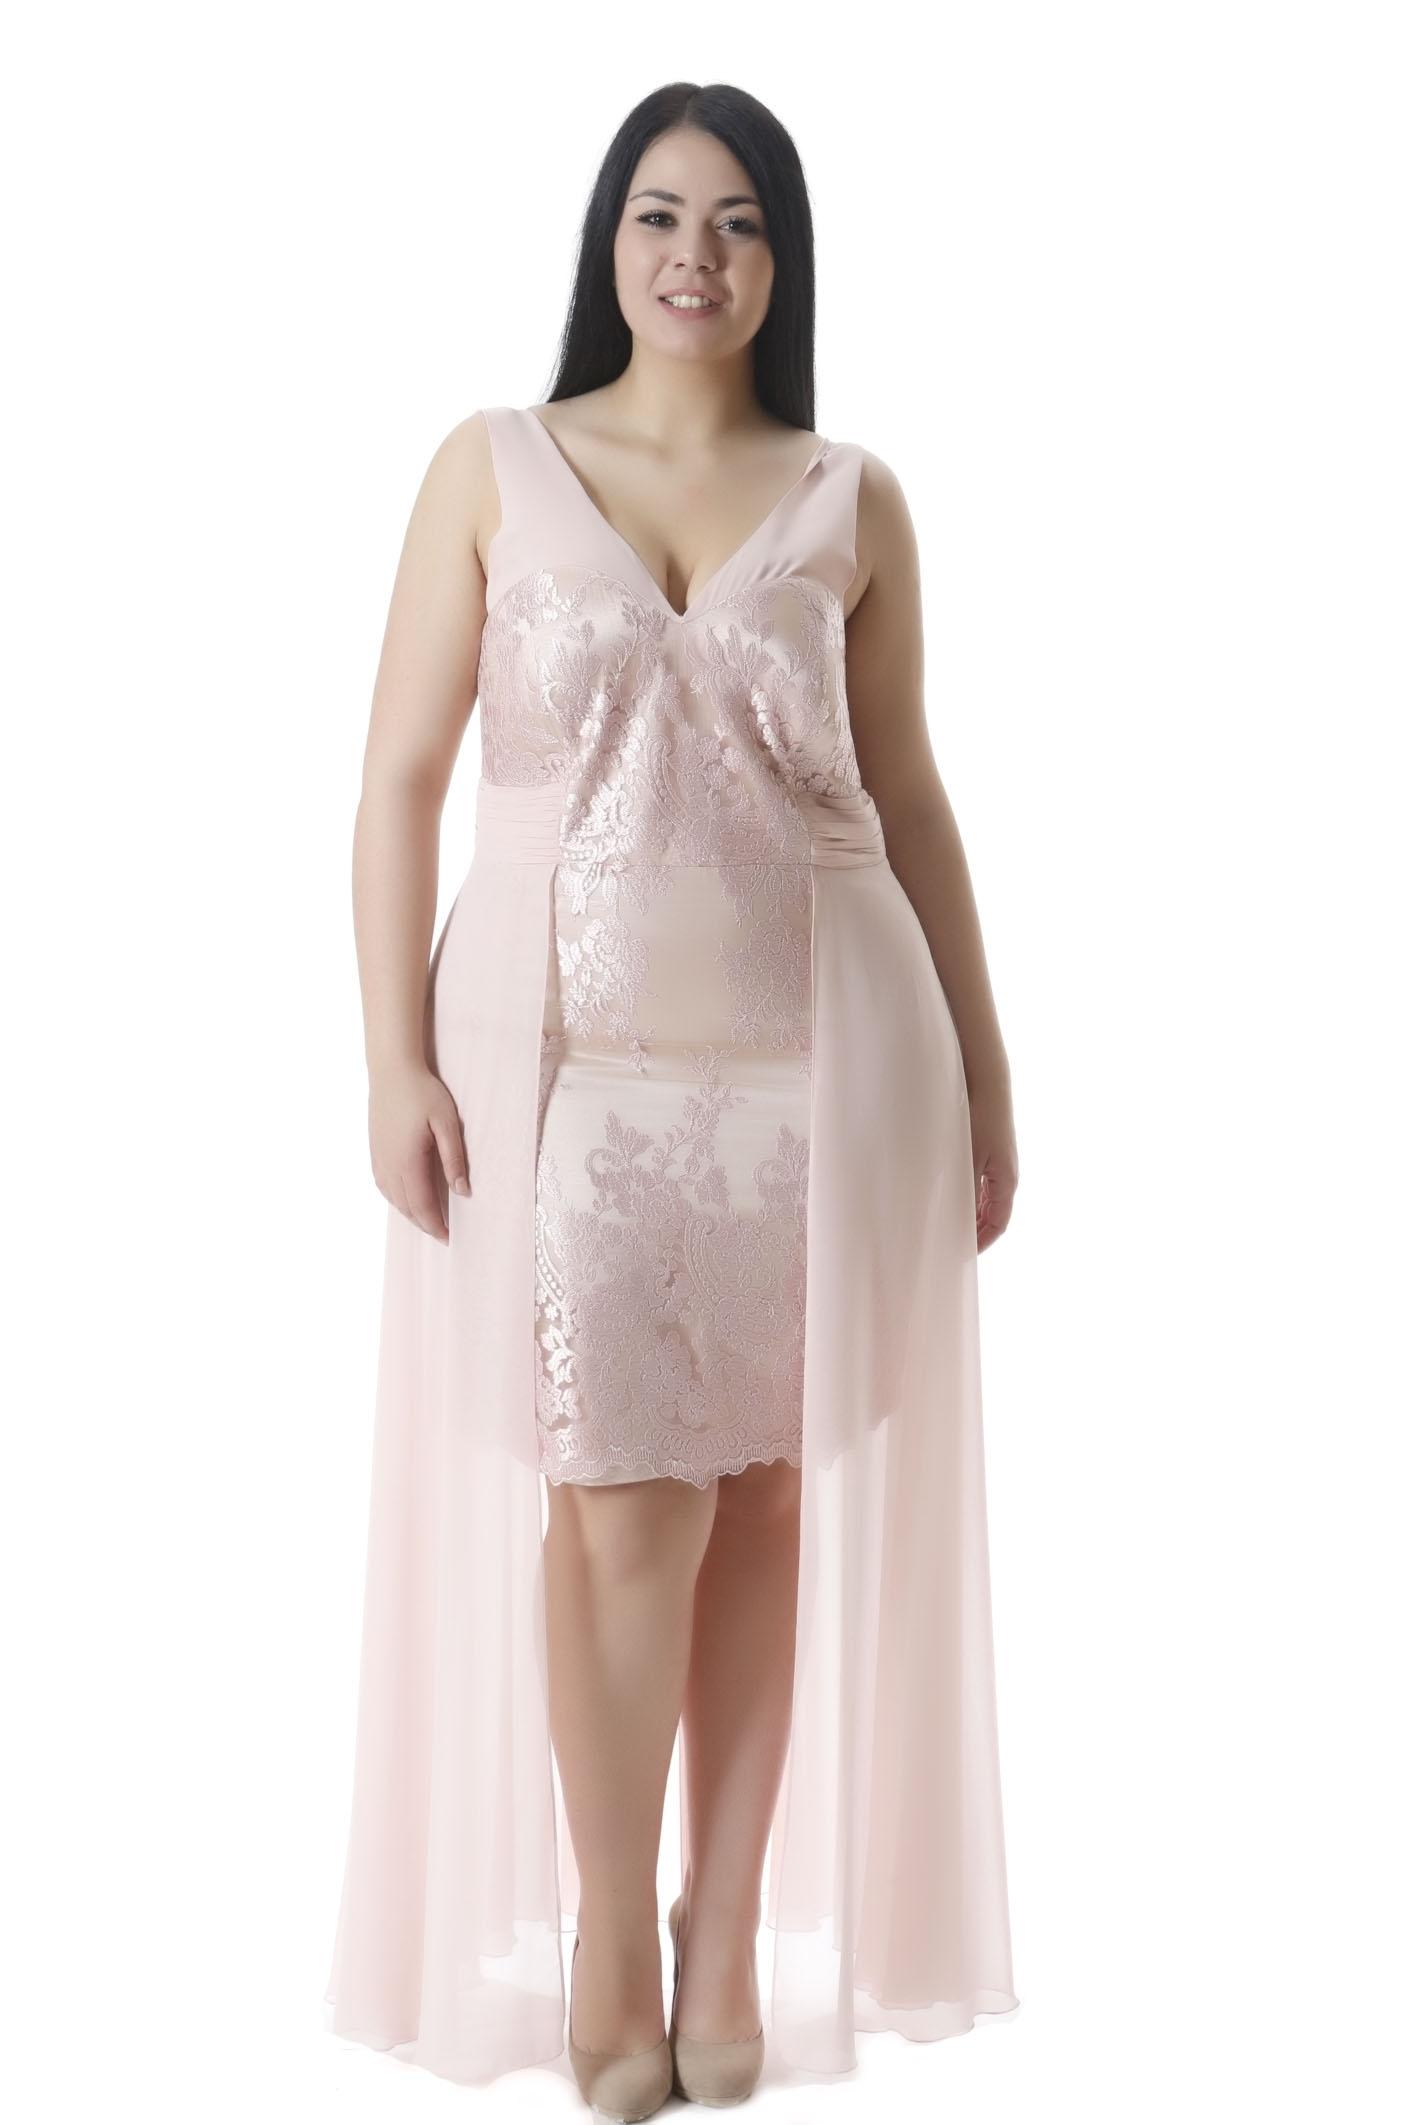 8436e792b5ff Φόρεμα αμπιγιέ Mini με δαντέλα στο μπροστινό μέρος Σε πούδρα χρώμα Αμάνικο  με V-λαιμόκοψη